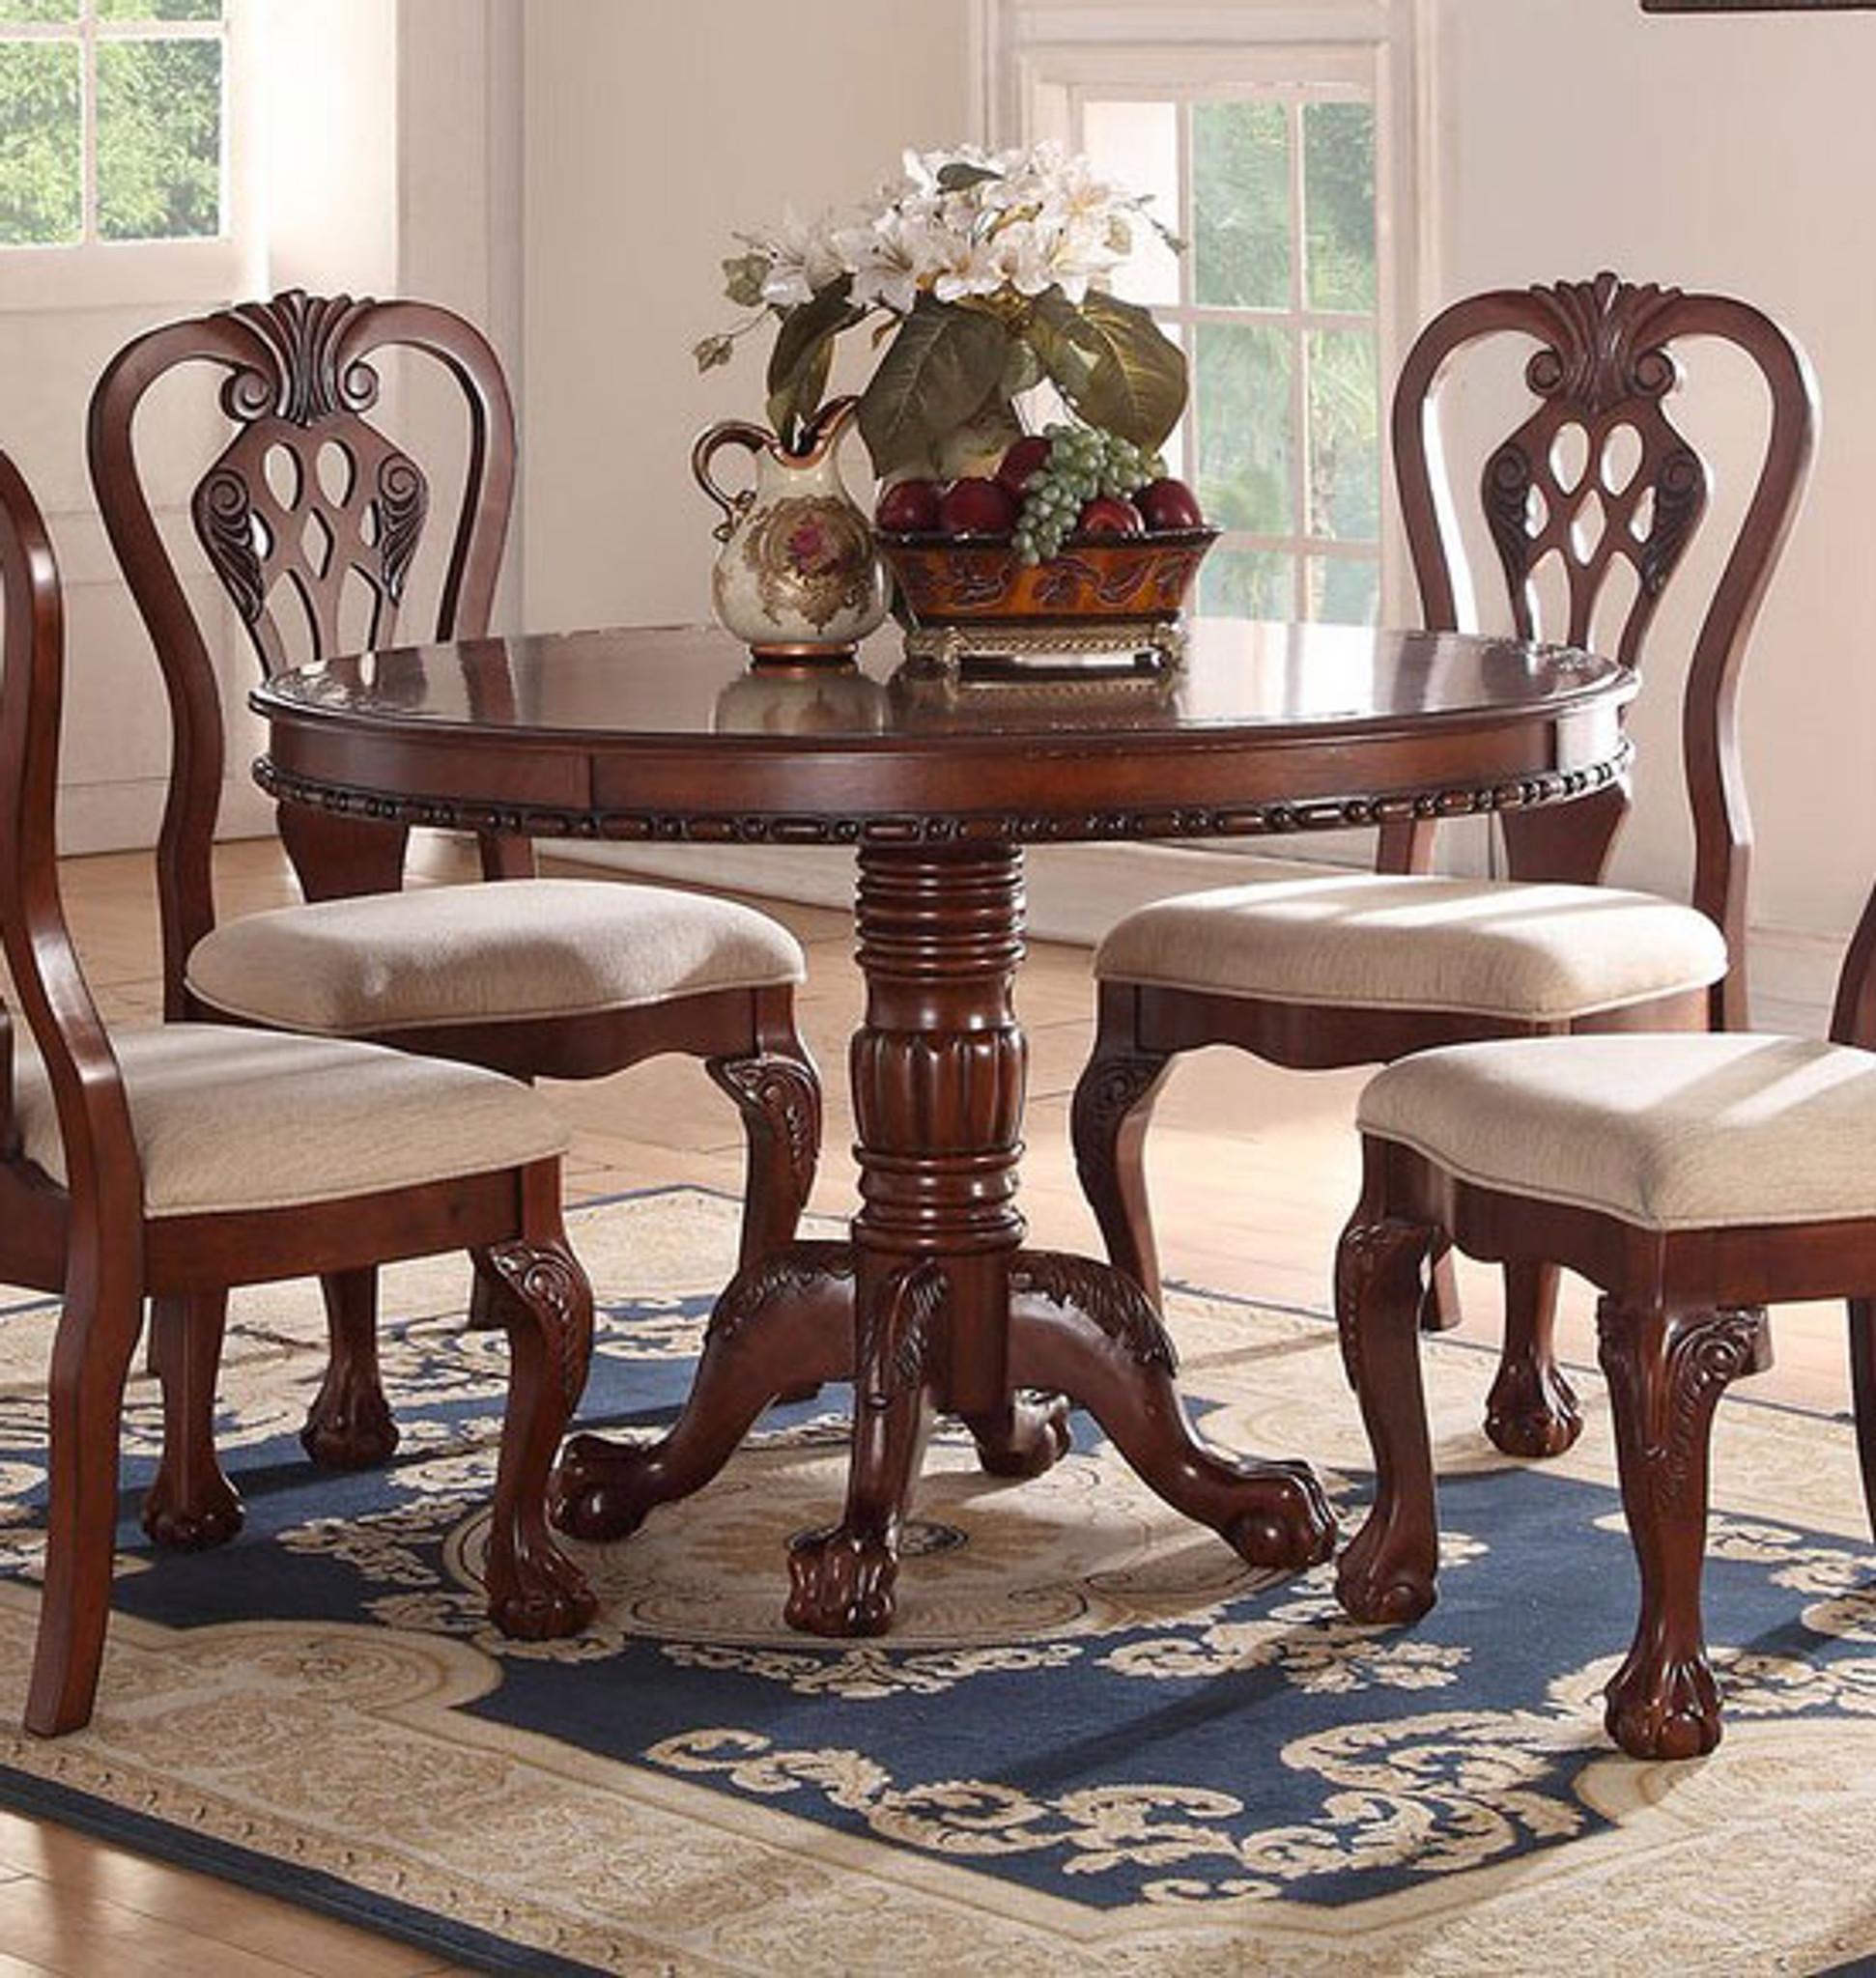 DARK CHERRY WOOD ROUND DINING TABLE